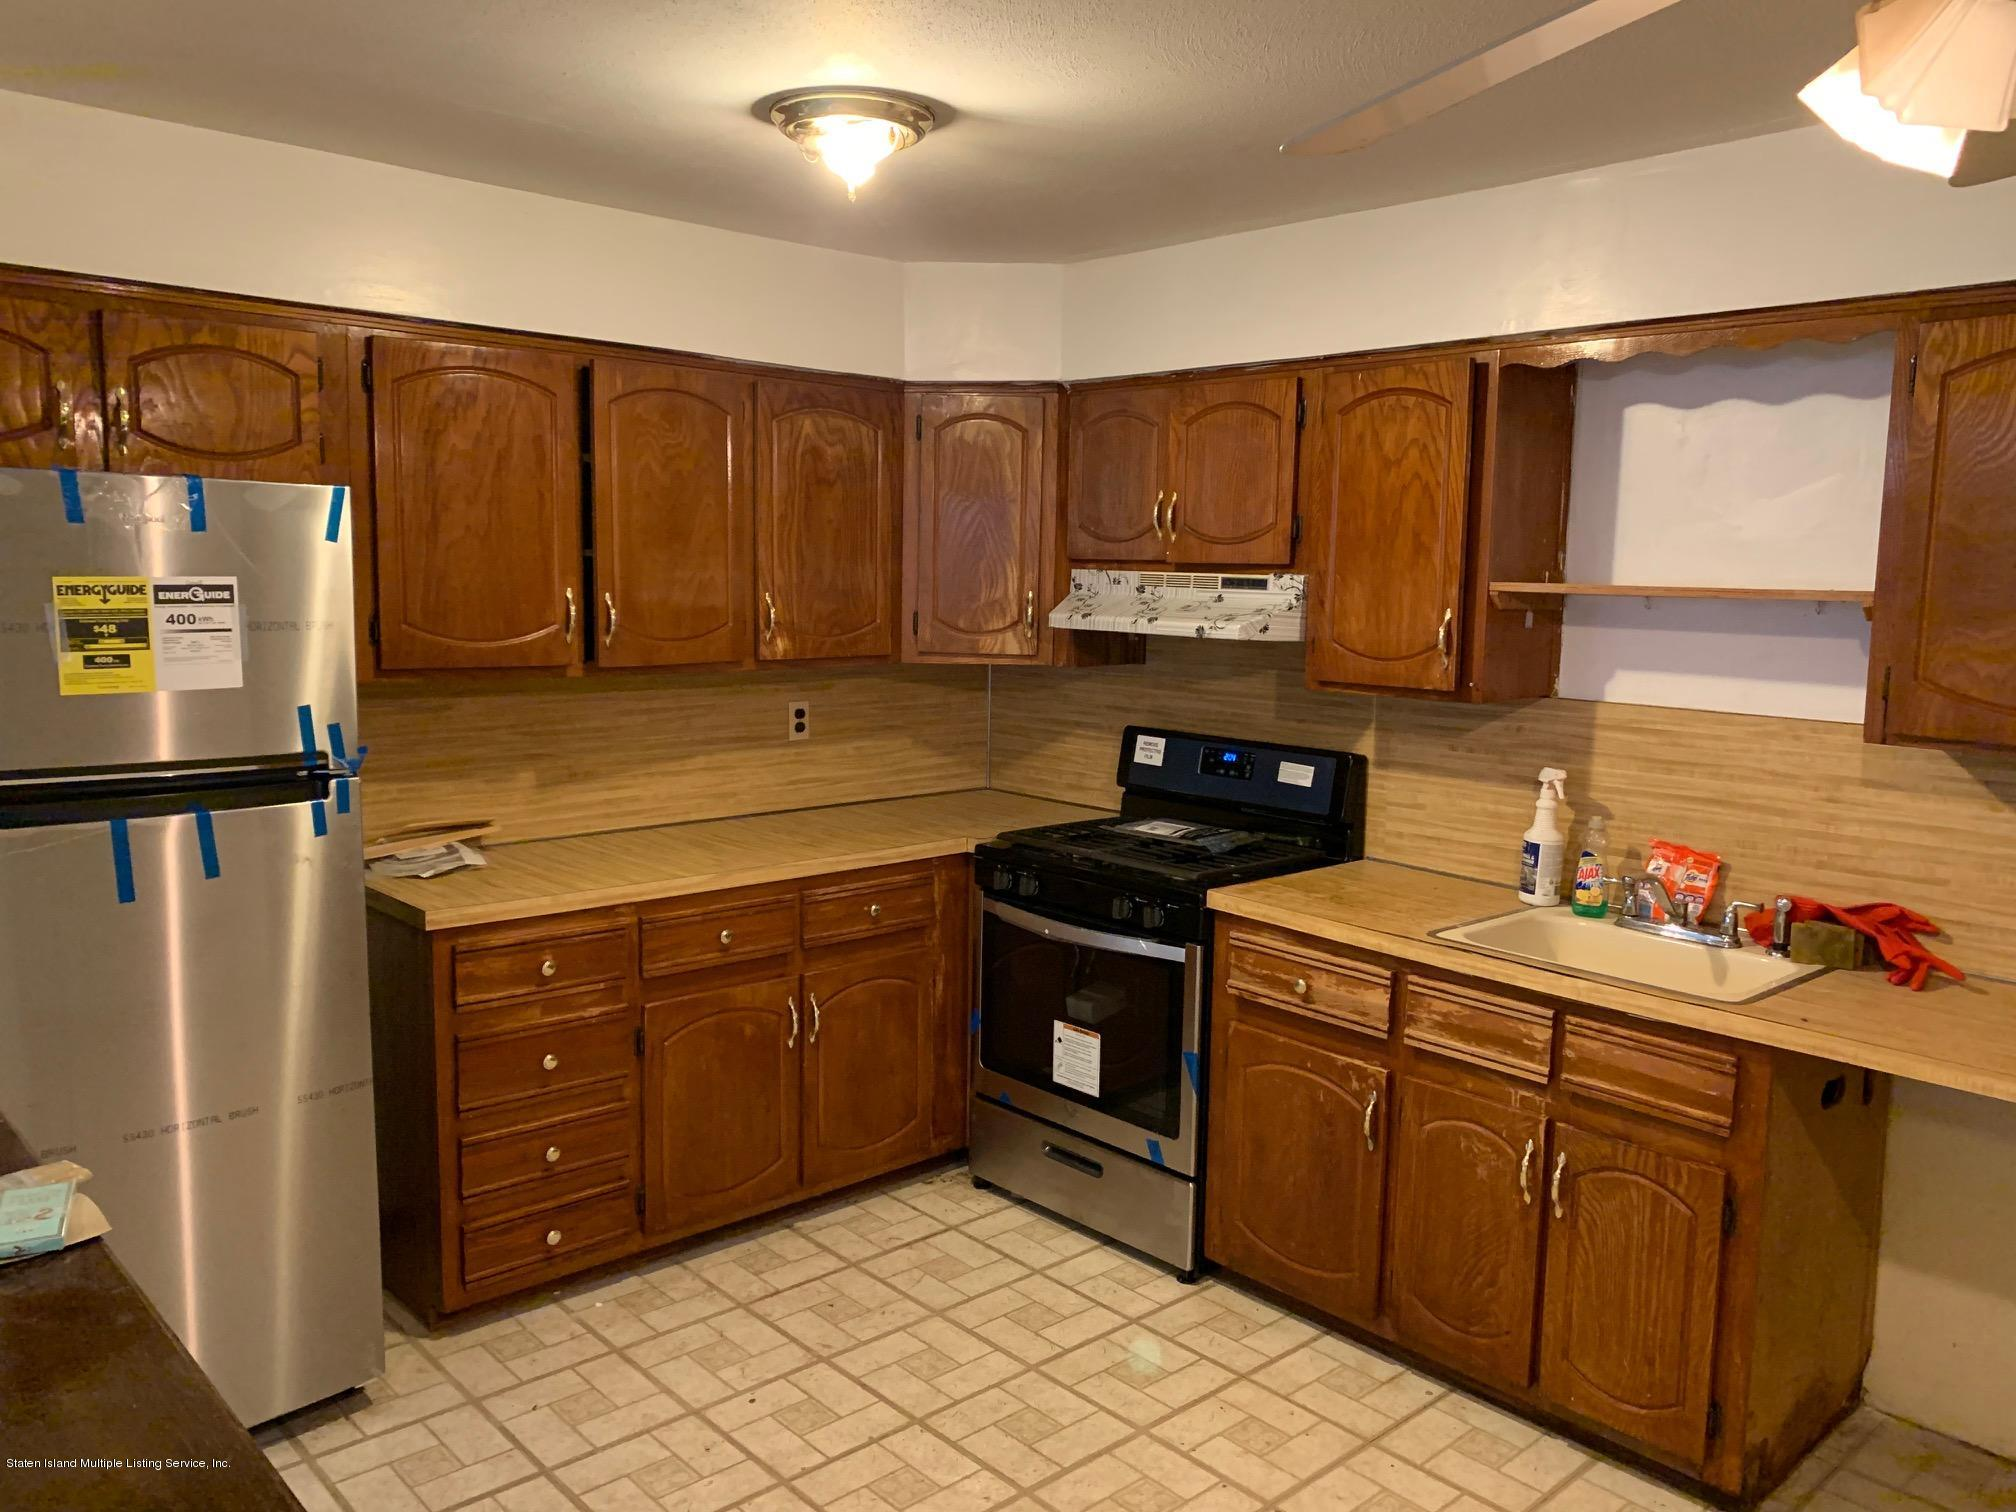 1 14 Mill Road,Staten Island,New York,10306,United States,2 Bedrooms Bedrooms,4 Rooms Rooms,1 BathroomBathrooms,Res-Rental,Mill,1134287